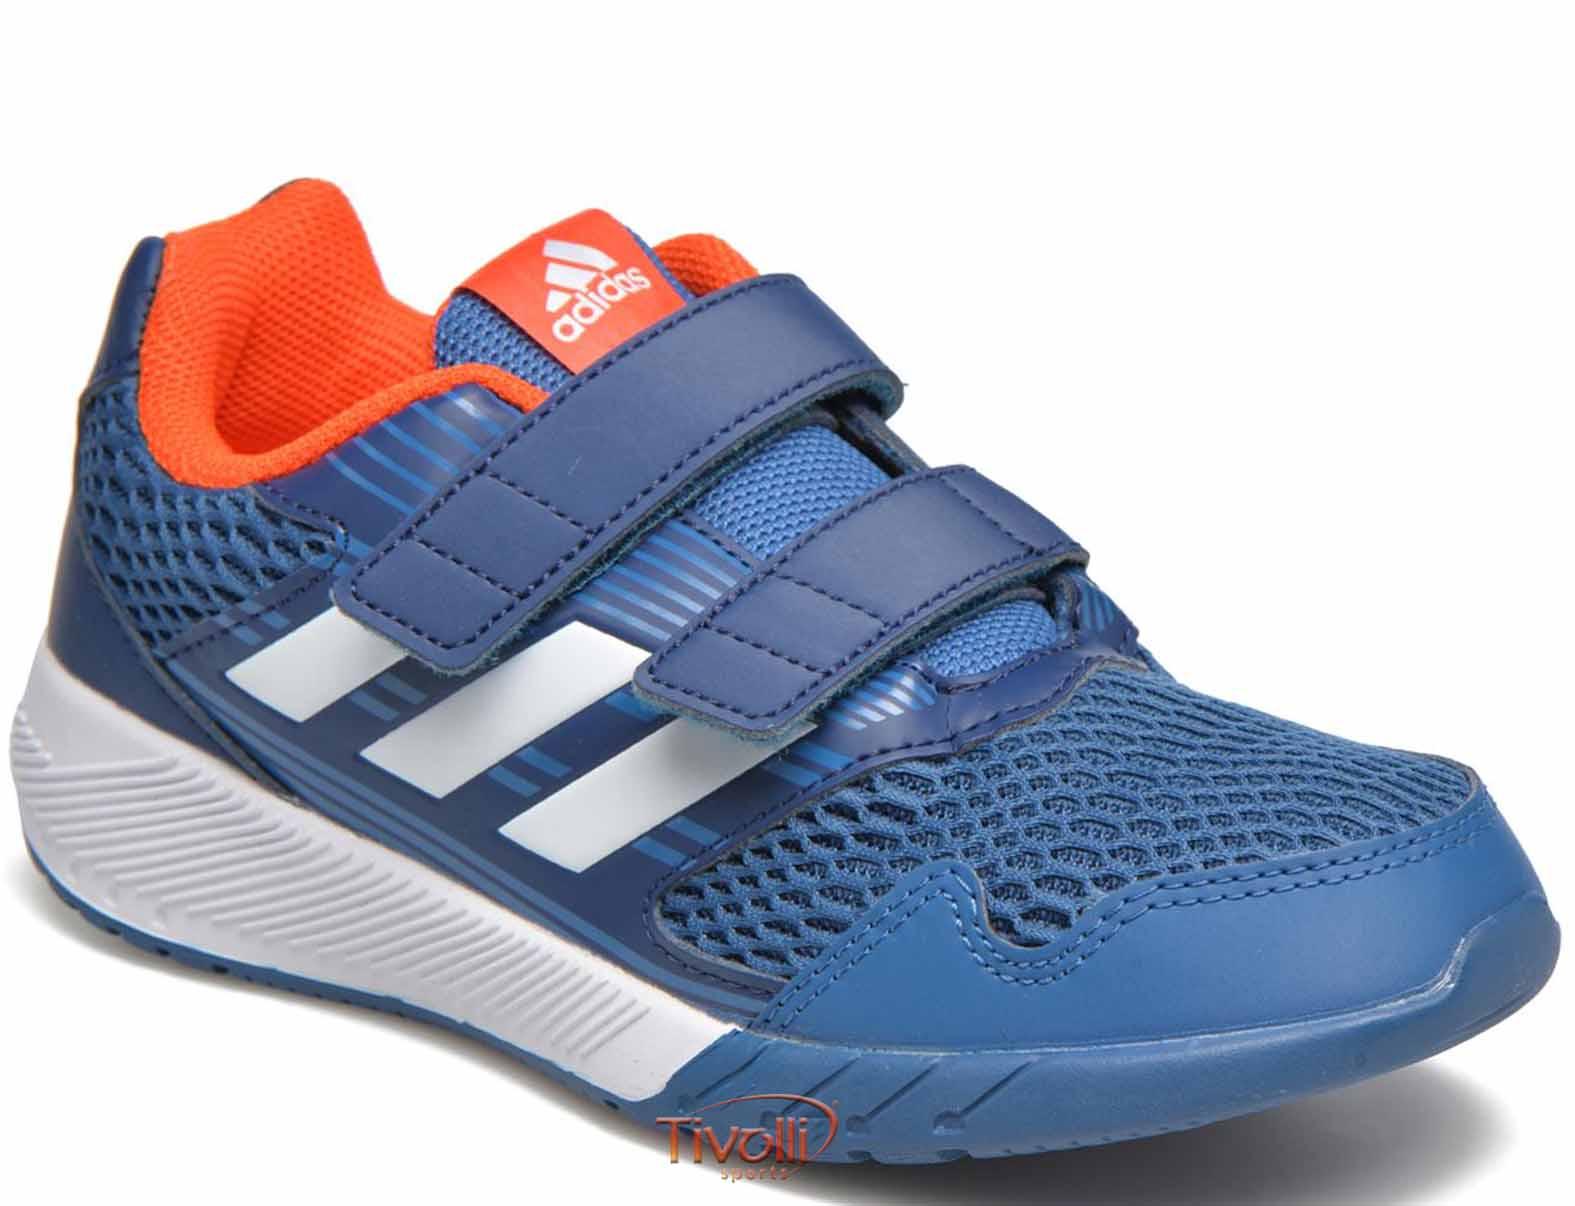 7095d3178c4 Tênis Adidas AltaRun CF K Infantil Velcro   Azul